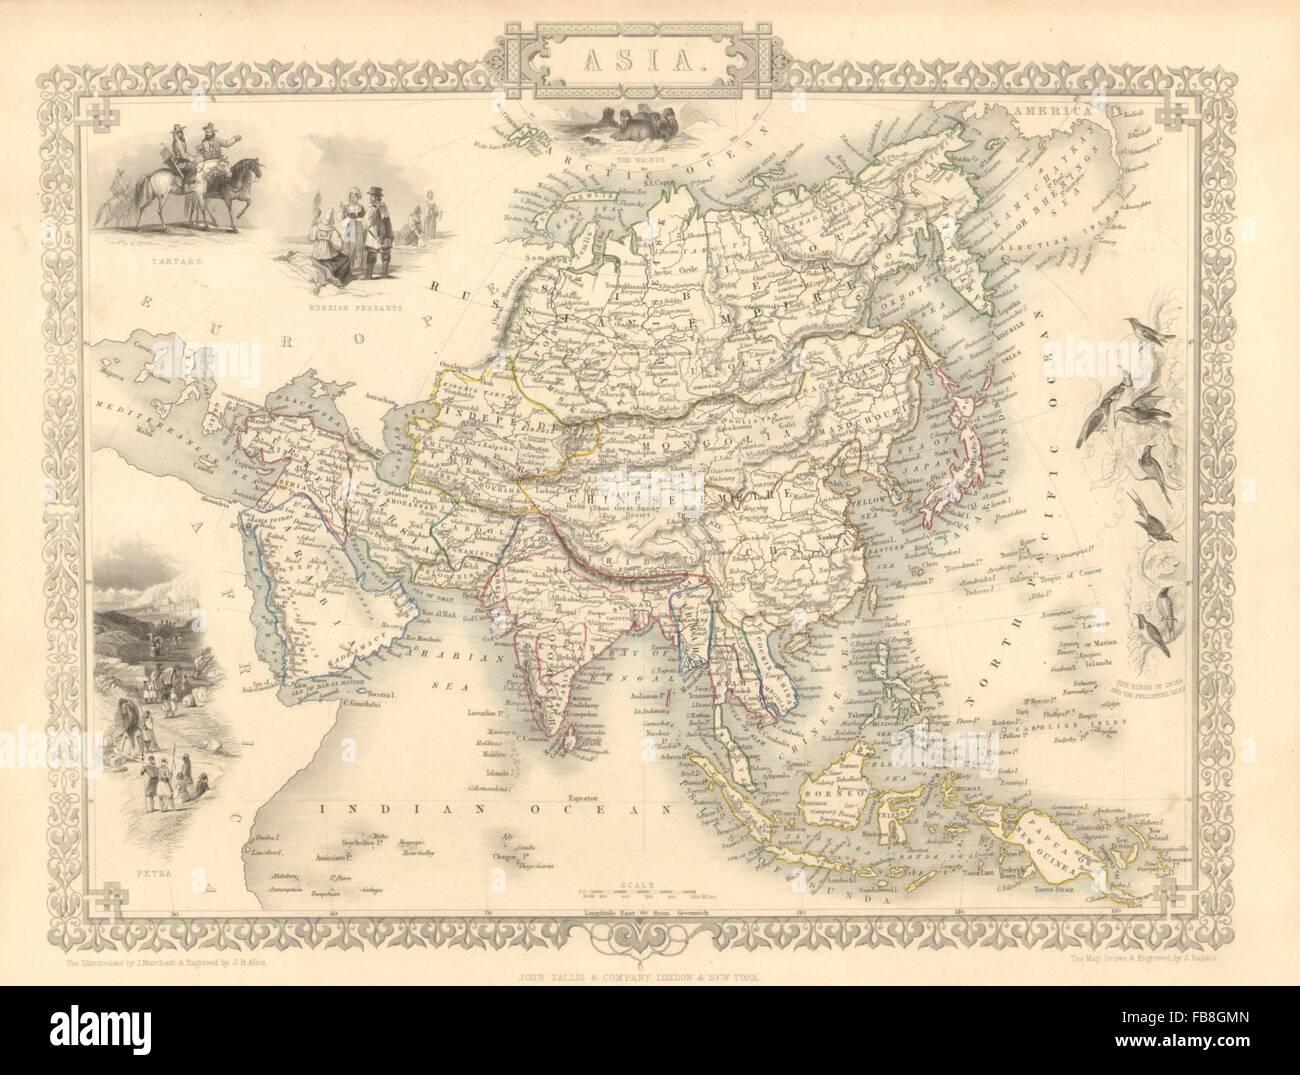 Weller 1862 Map Asia W/ Great Wall Of China Tartary Siam Anam.sarawak Kingdom